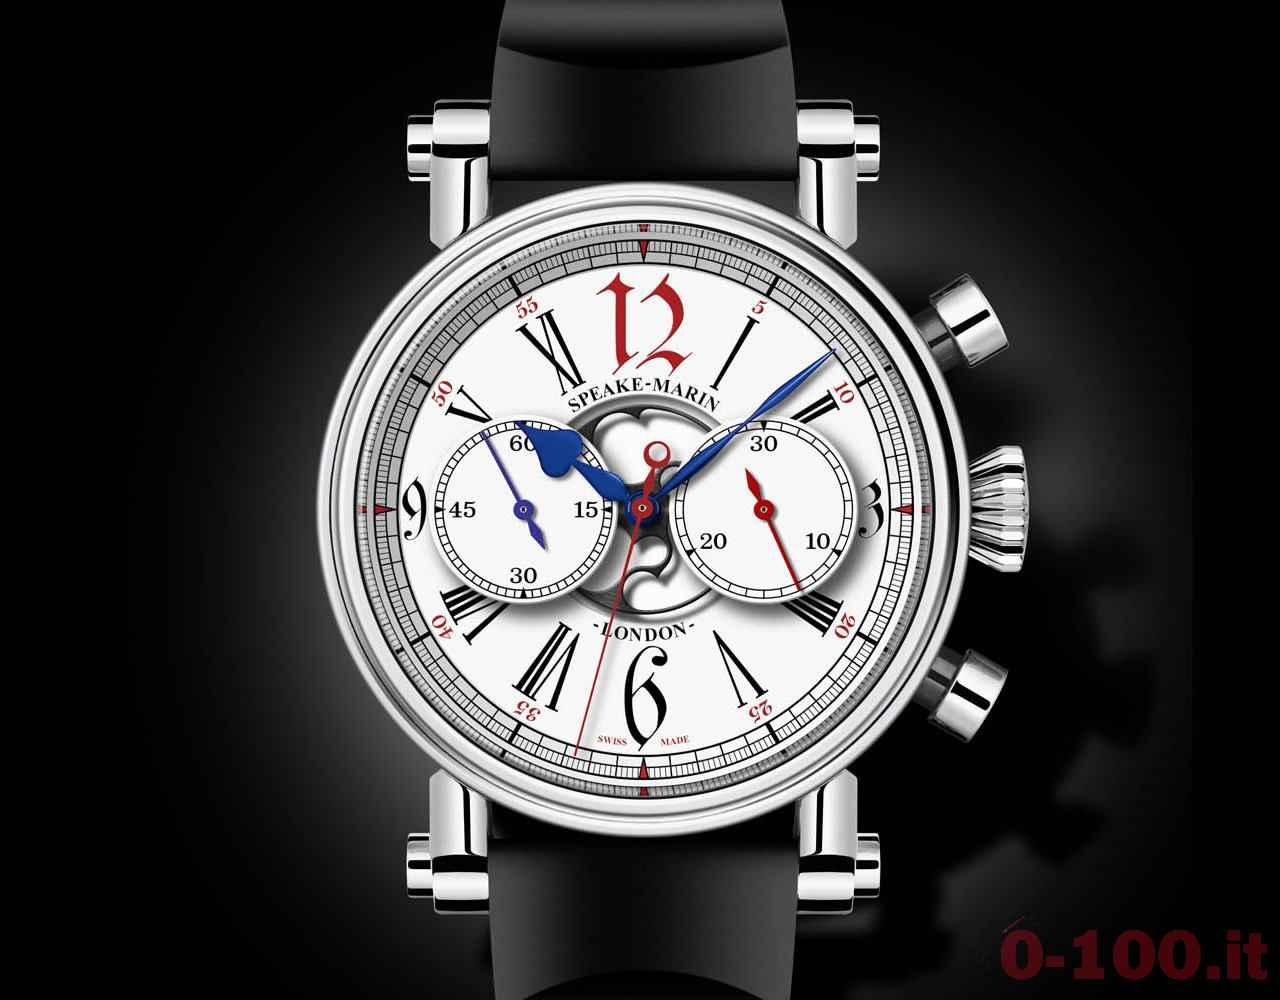 Speake-Marin-London-Chronograph-Special-Edition-Harrods-vintage-Valjoux-92-movement-4